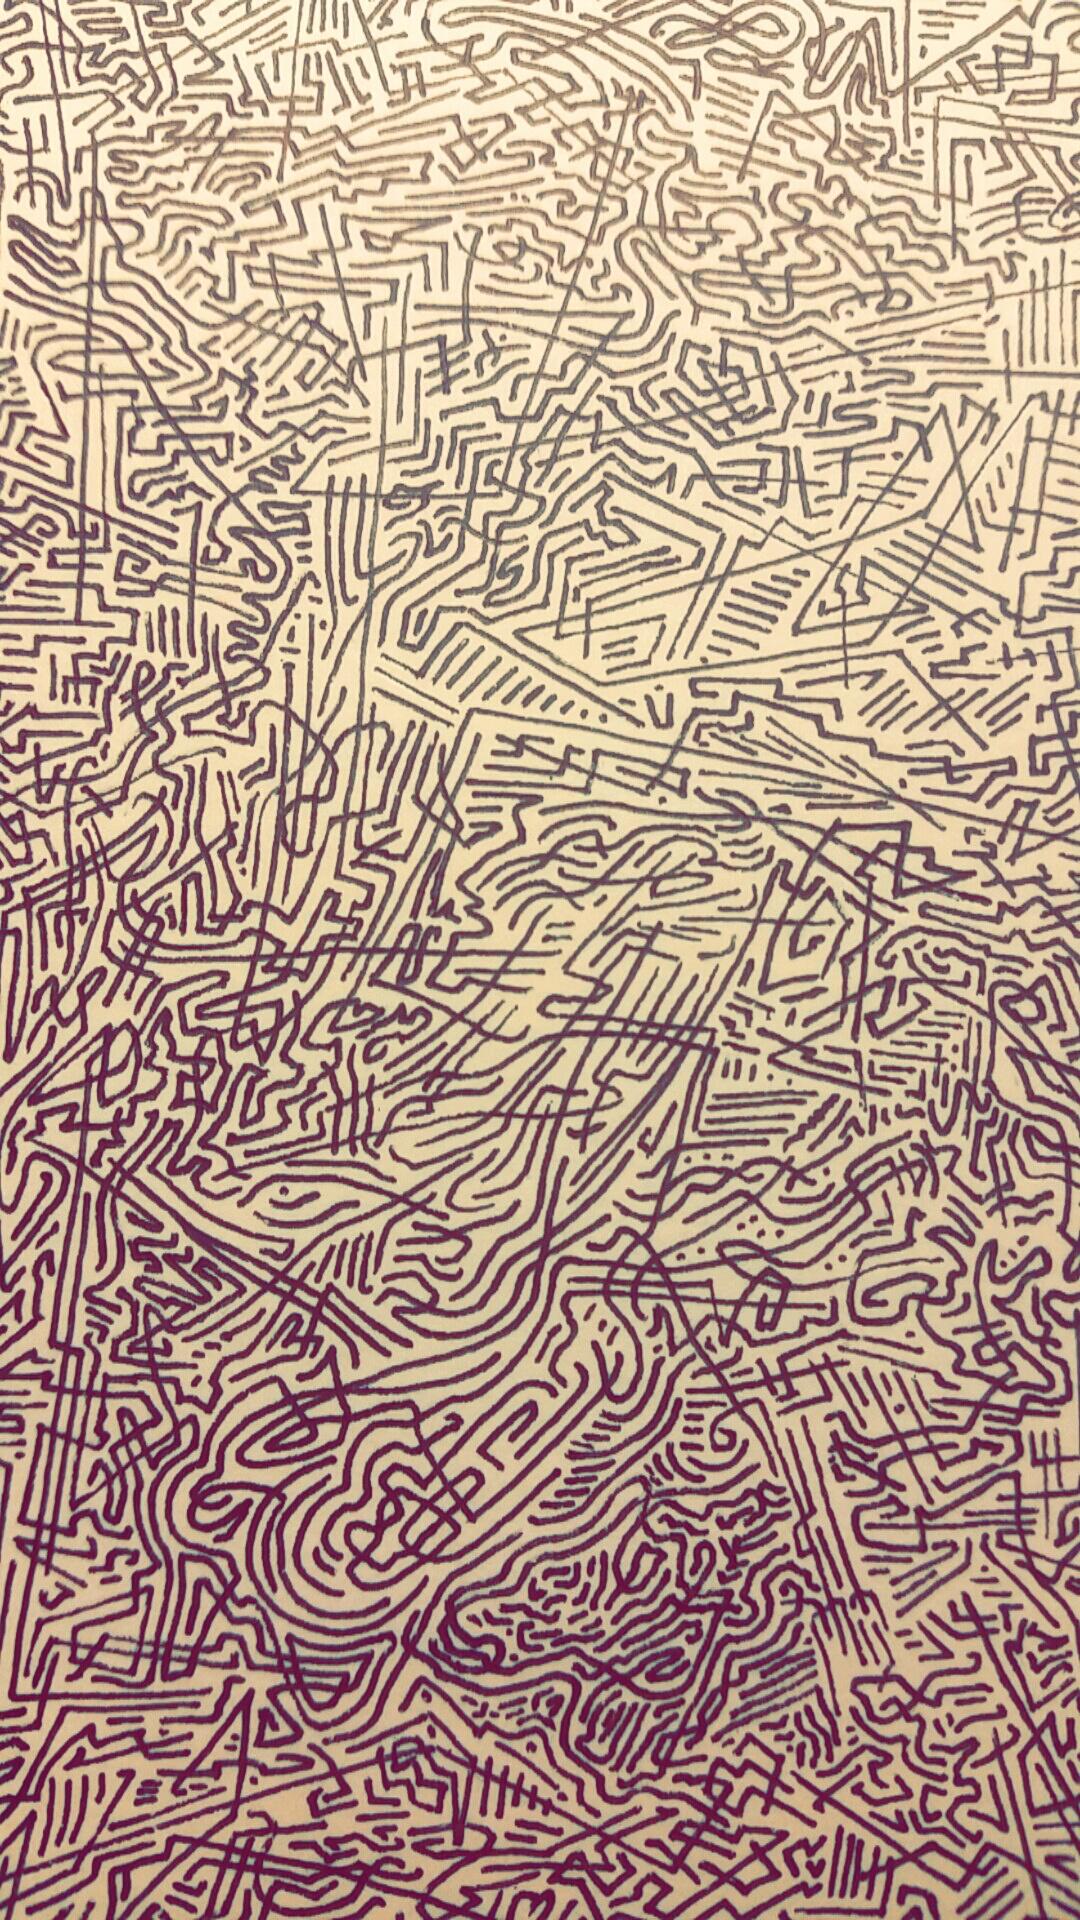 Dizzy Plexus. Artwork by Hasan Samdani, M1.